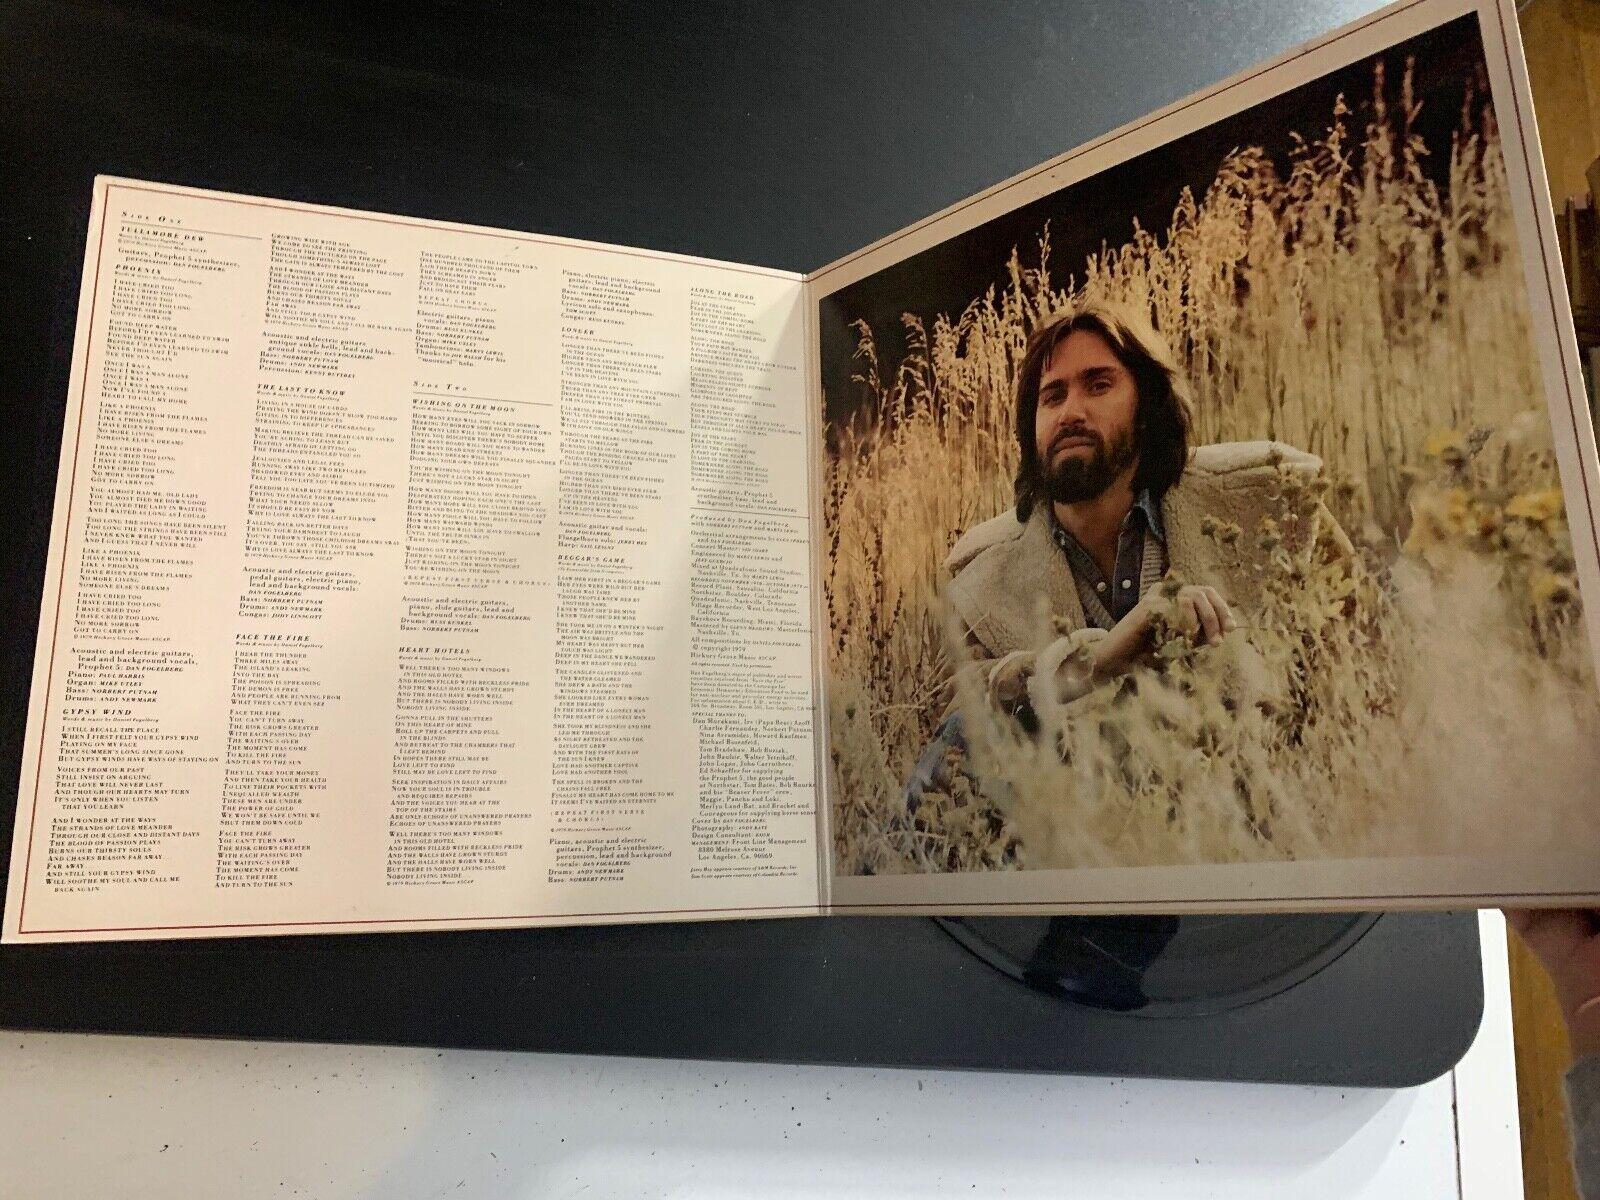 LP RECORD - DAN FOGELBERG - PHOENIX - EPIC RECORDS - $9.99